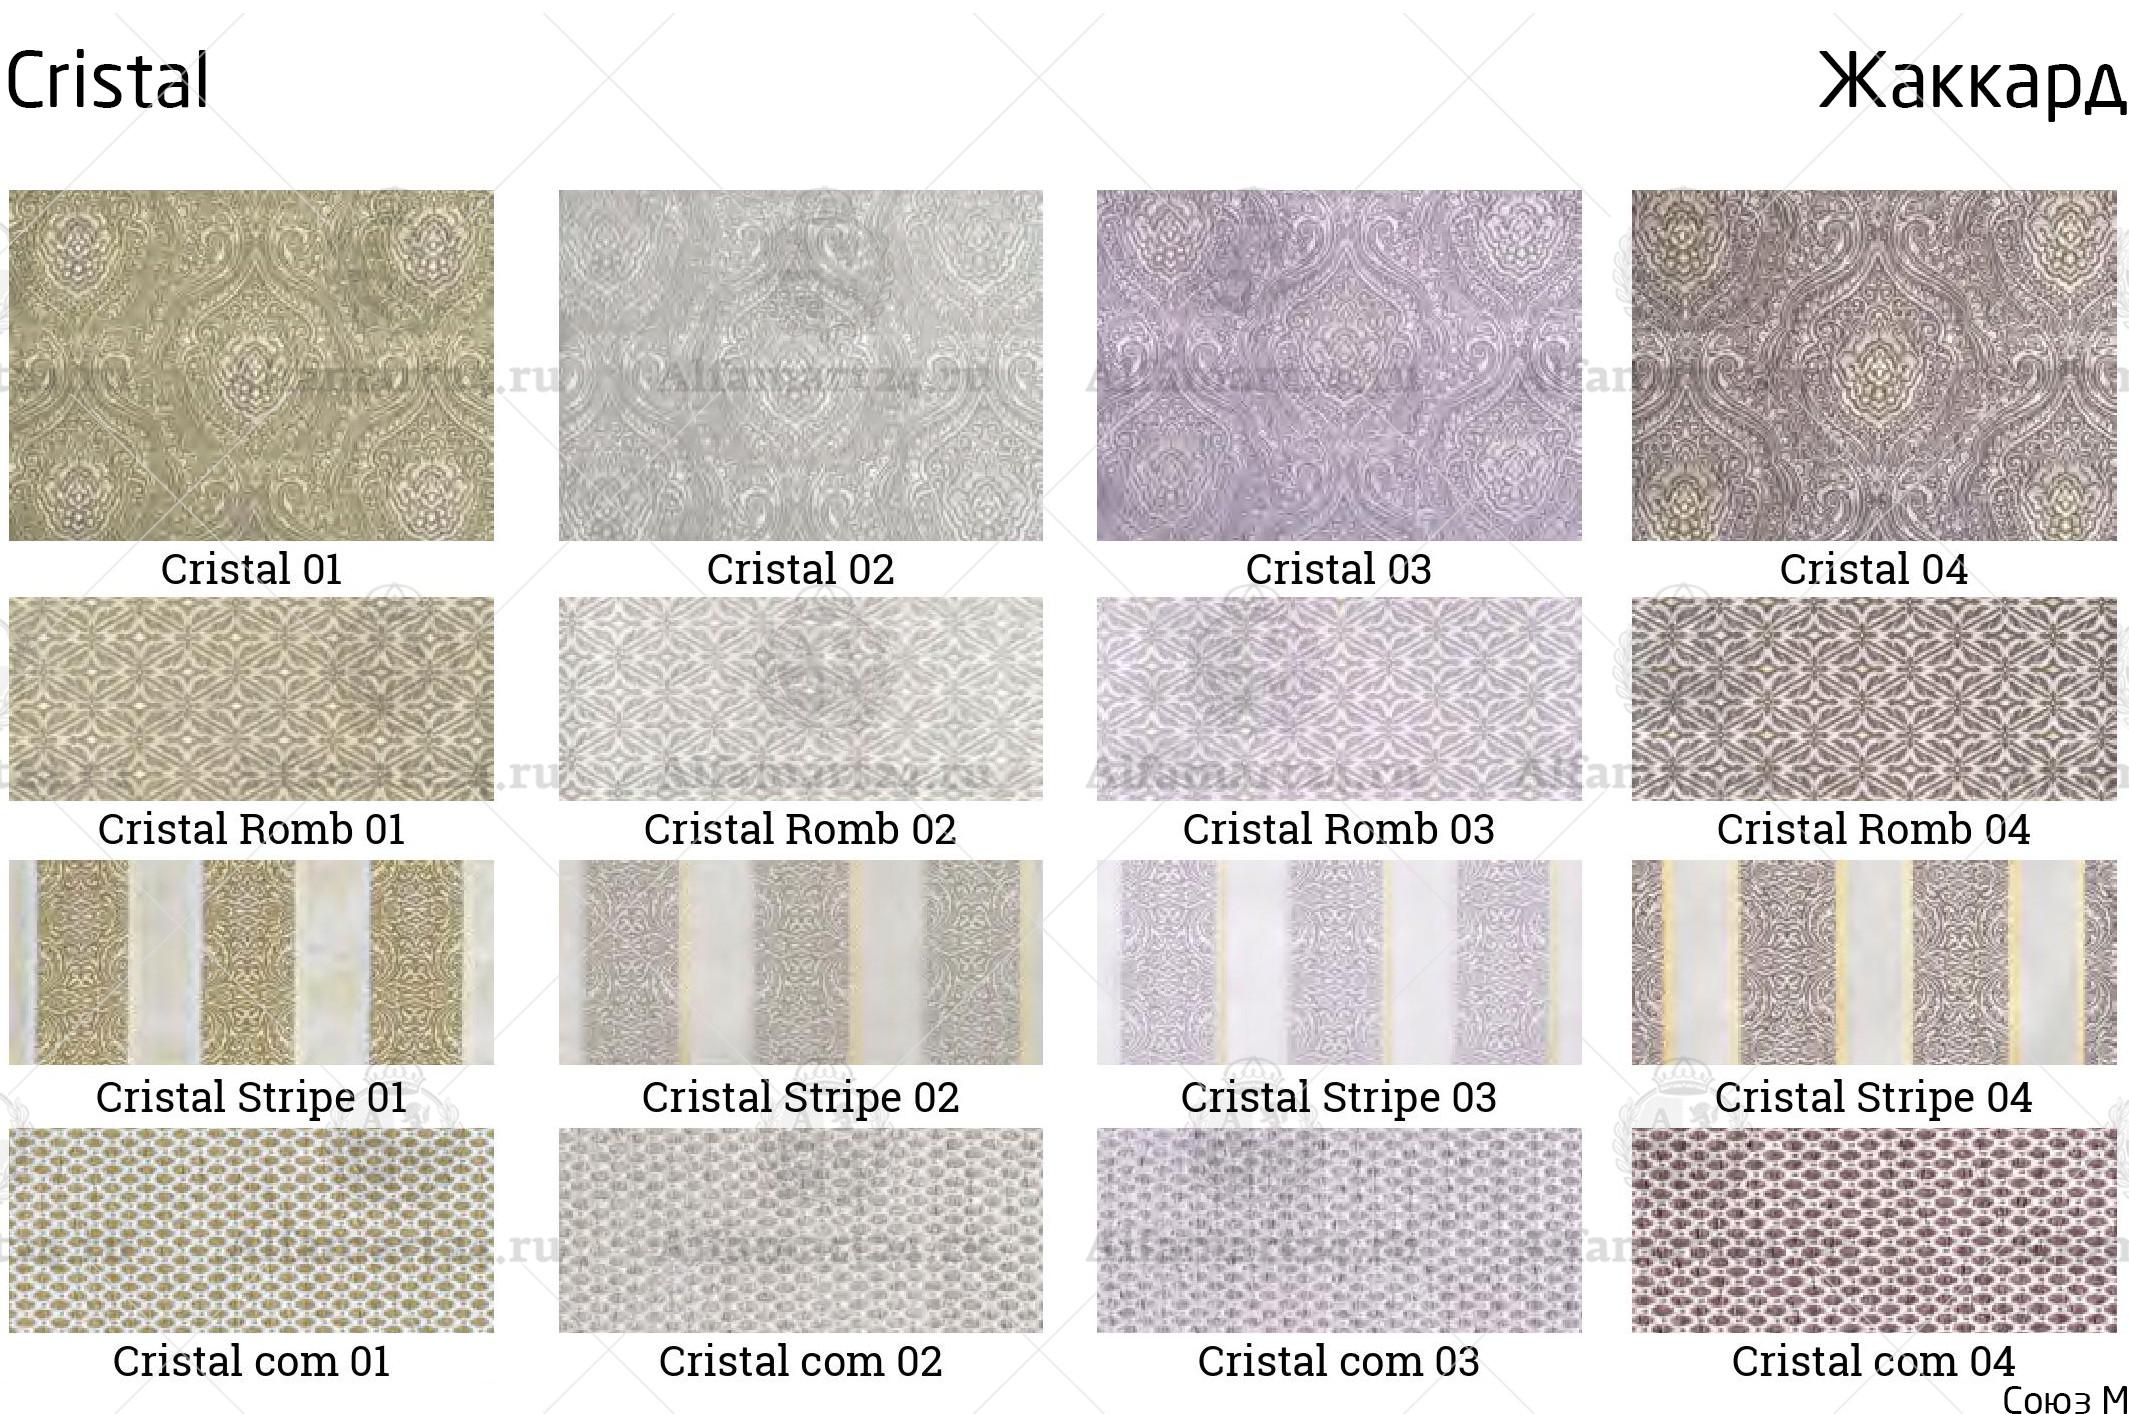 Cristal (жаккард) Союз М